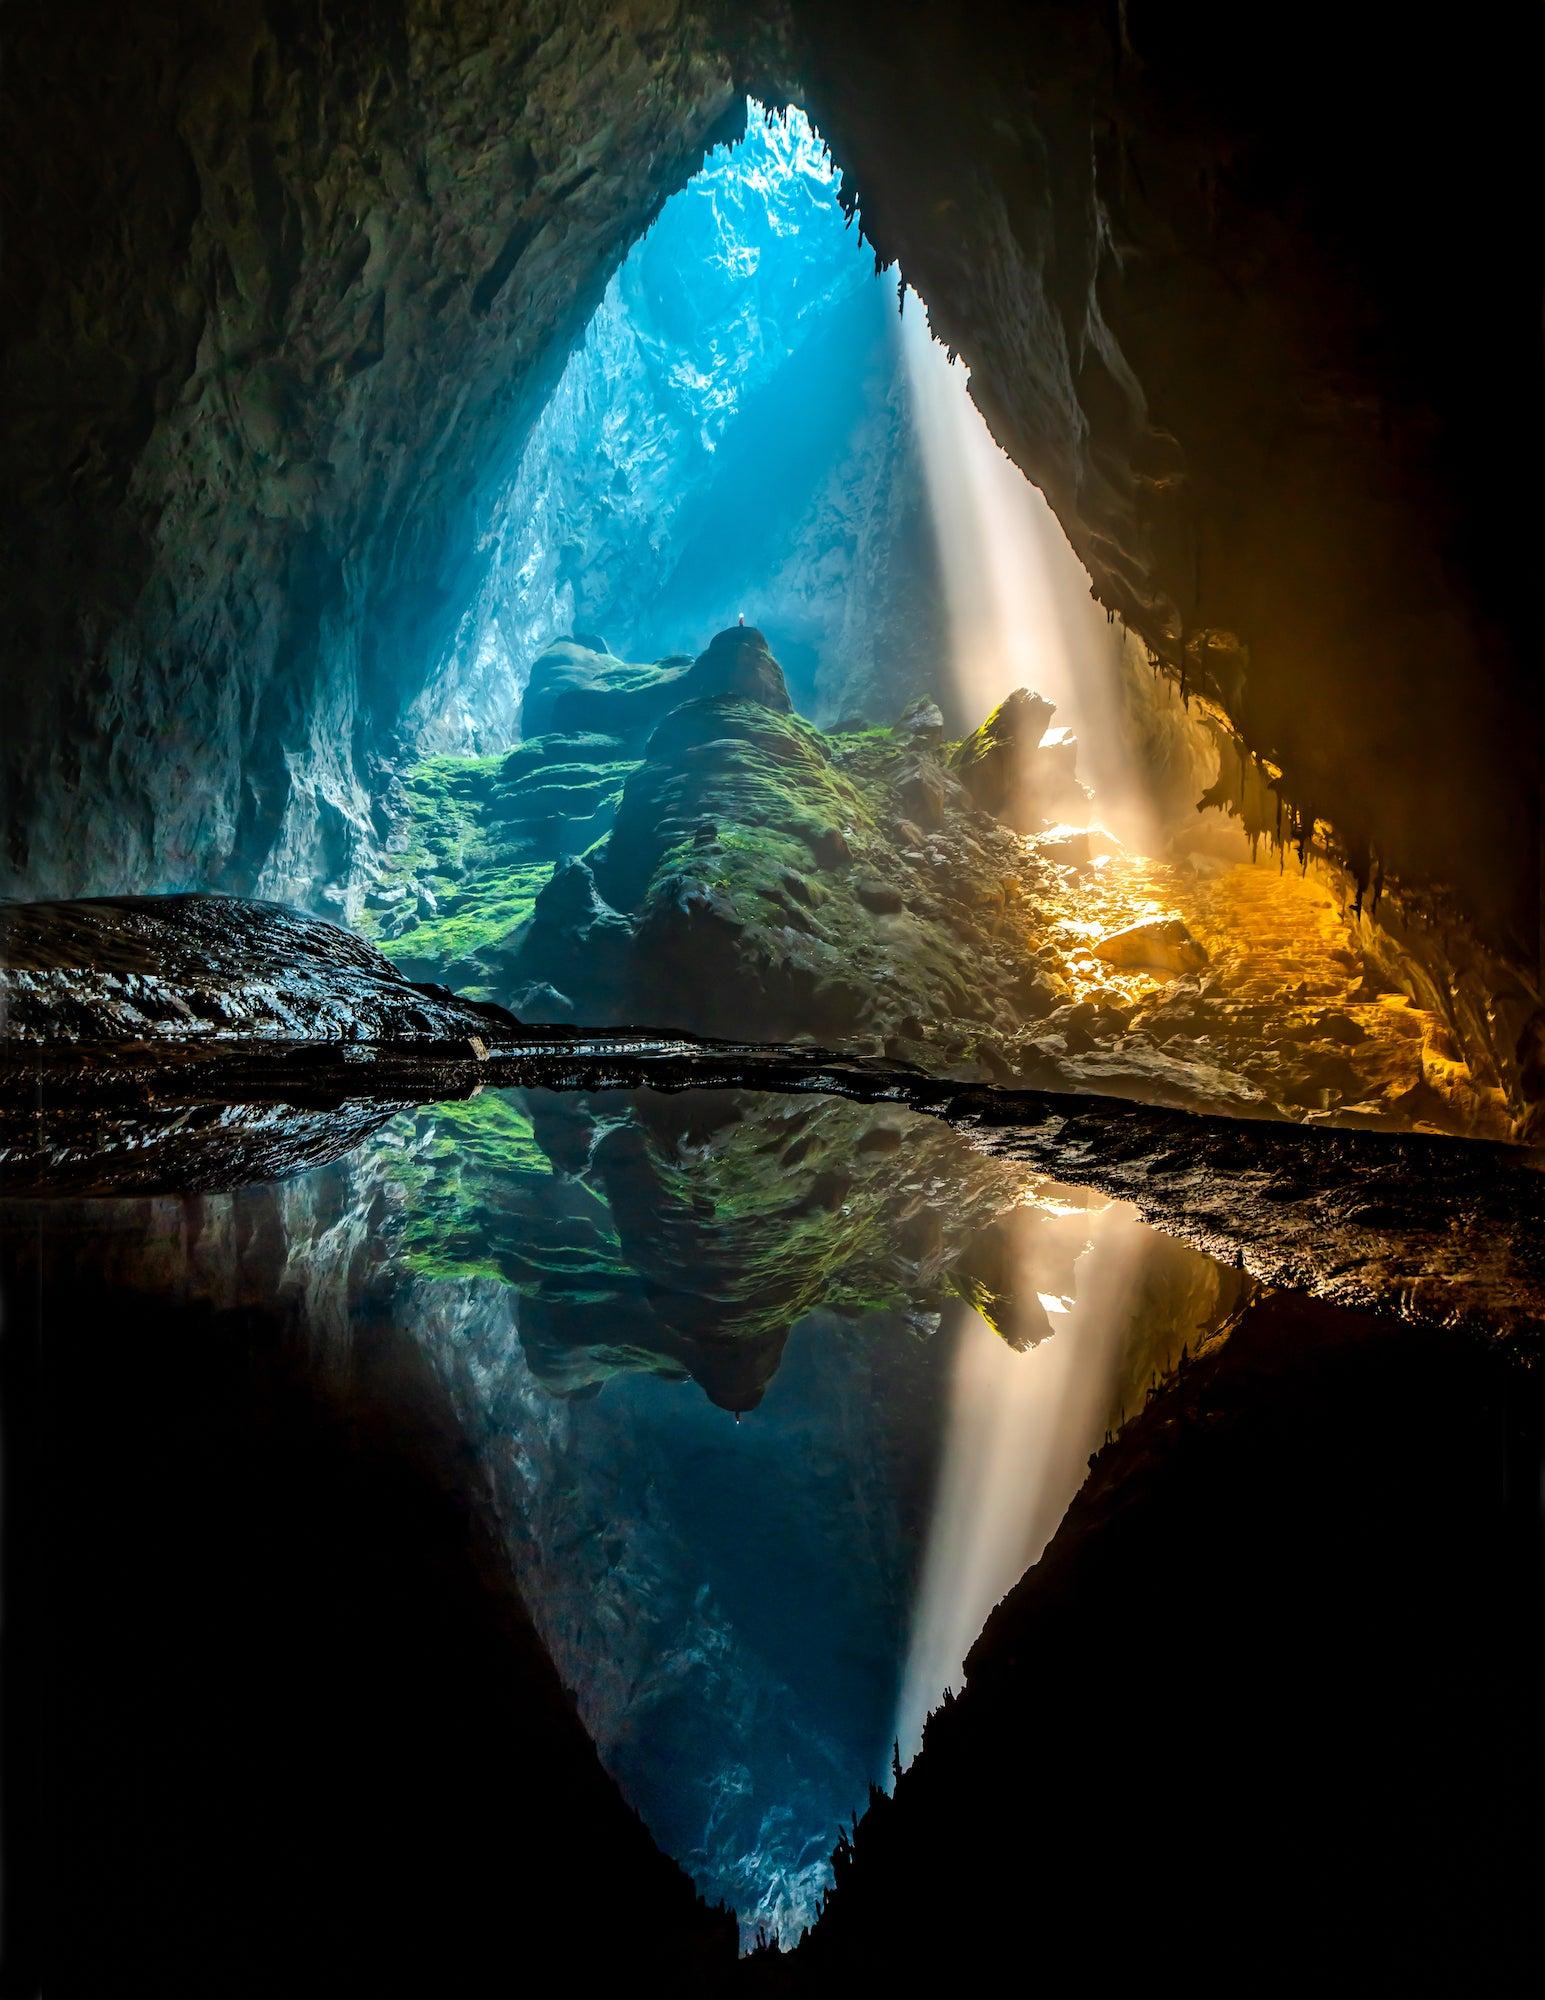 Alpha-Universe-Wyatt-Peterson-Cave-Photography-Sony-a7riii-3.jpeg